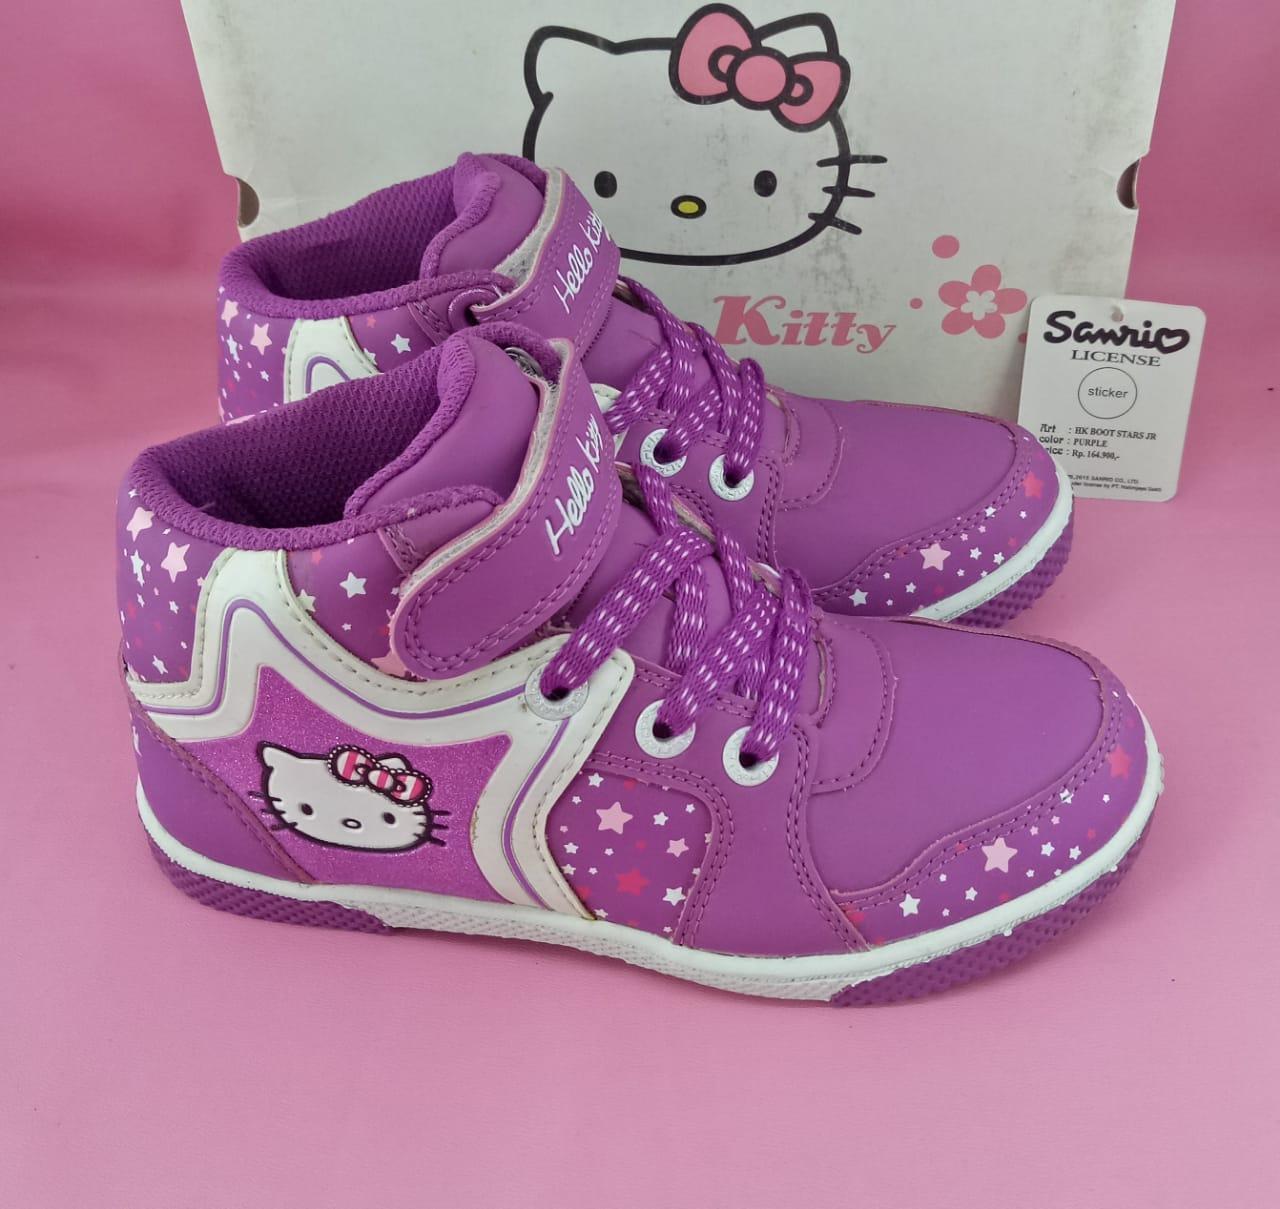 HARGA-PROMO-Sepatu karakter hellokity anak Ando hk boots star ungu 32-35 6f1a8dbef5